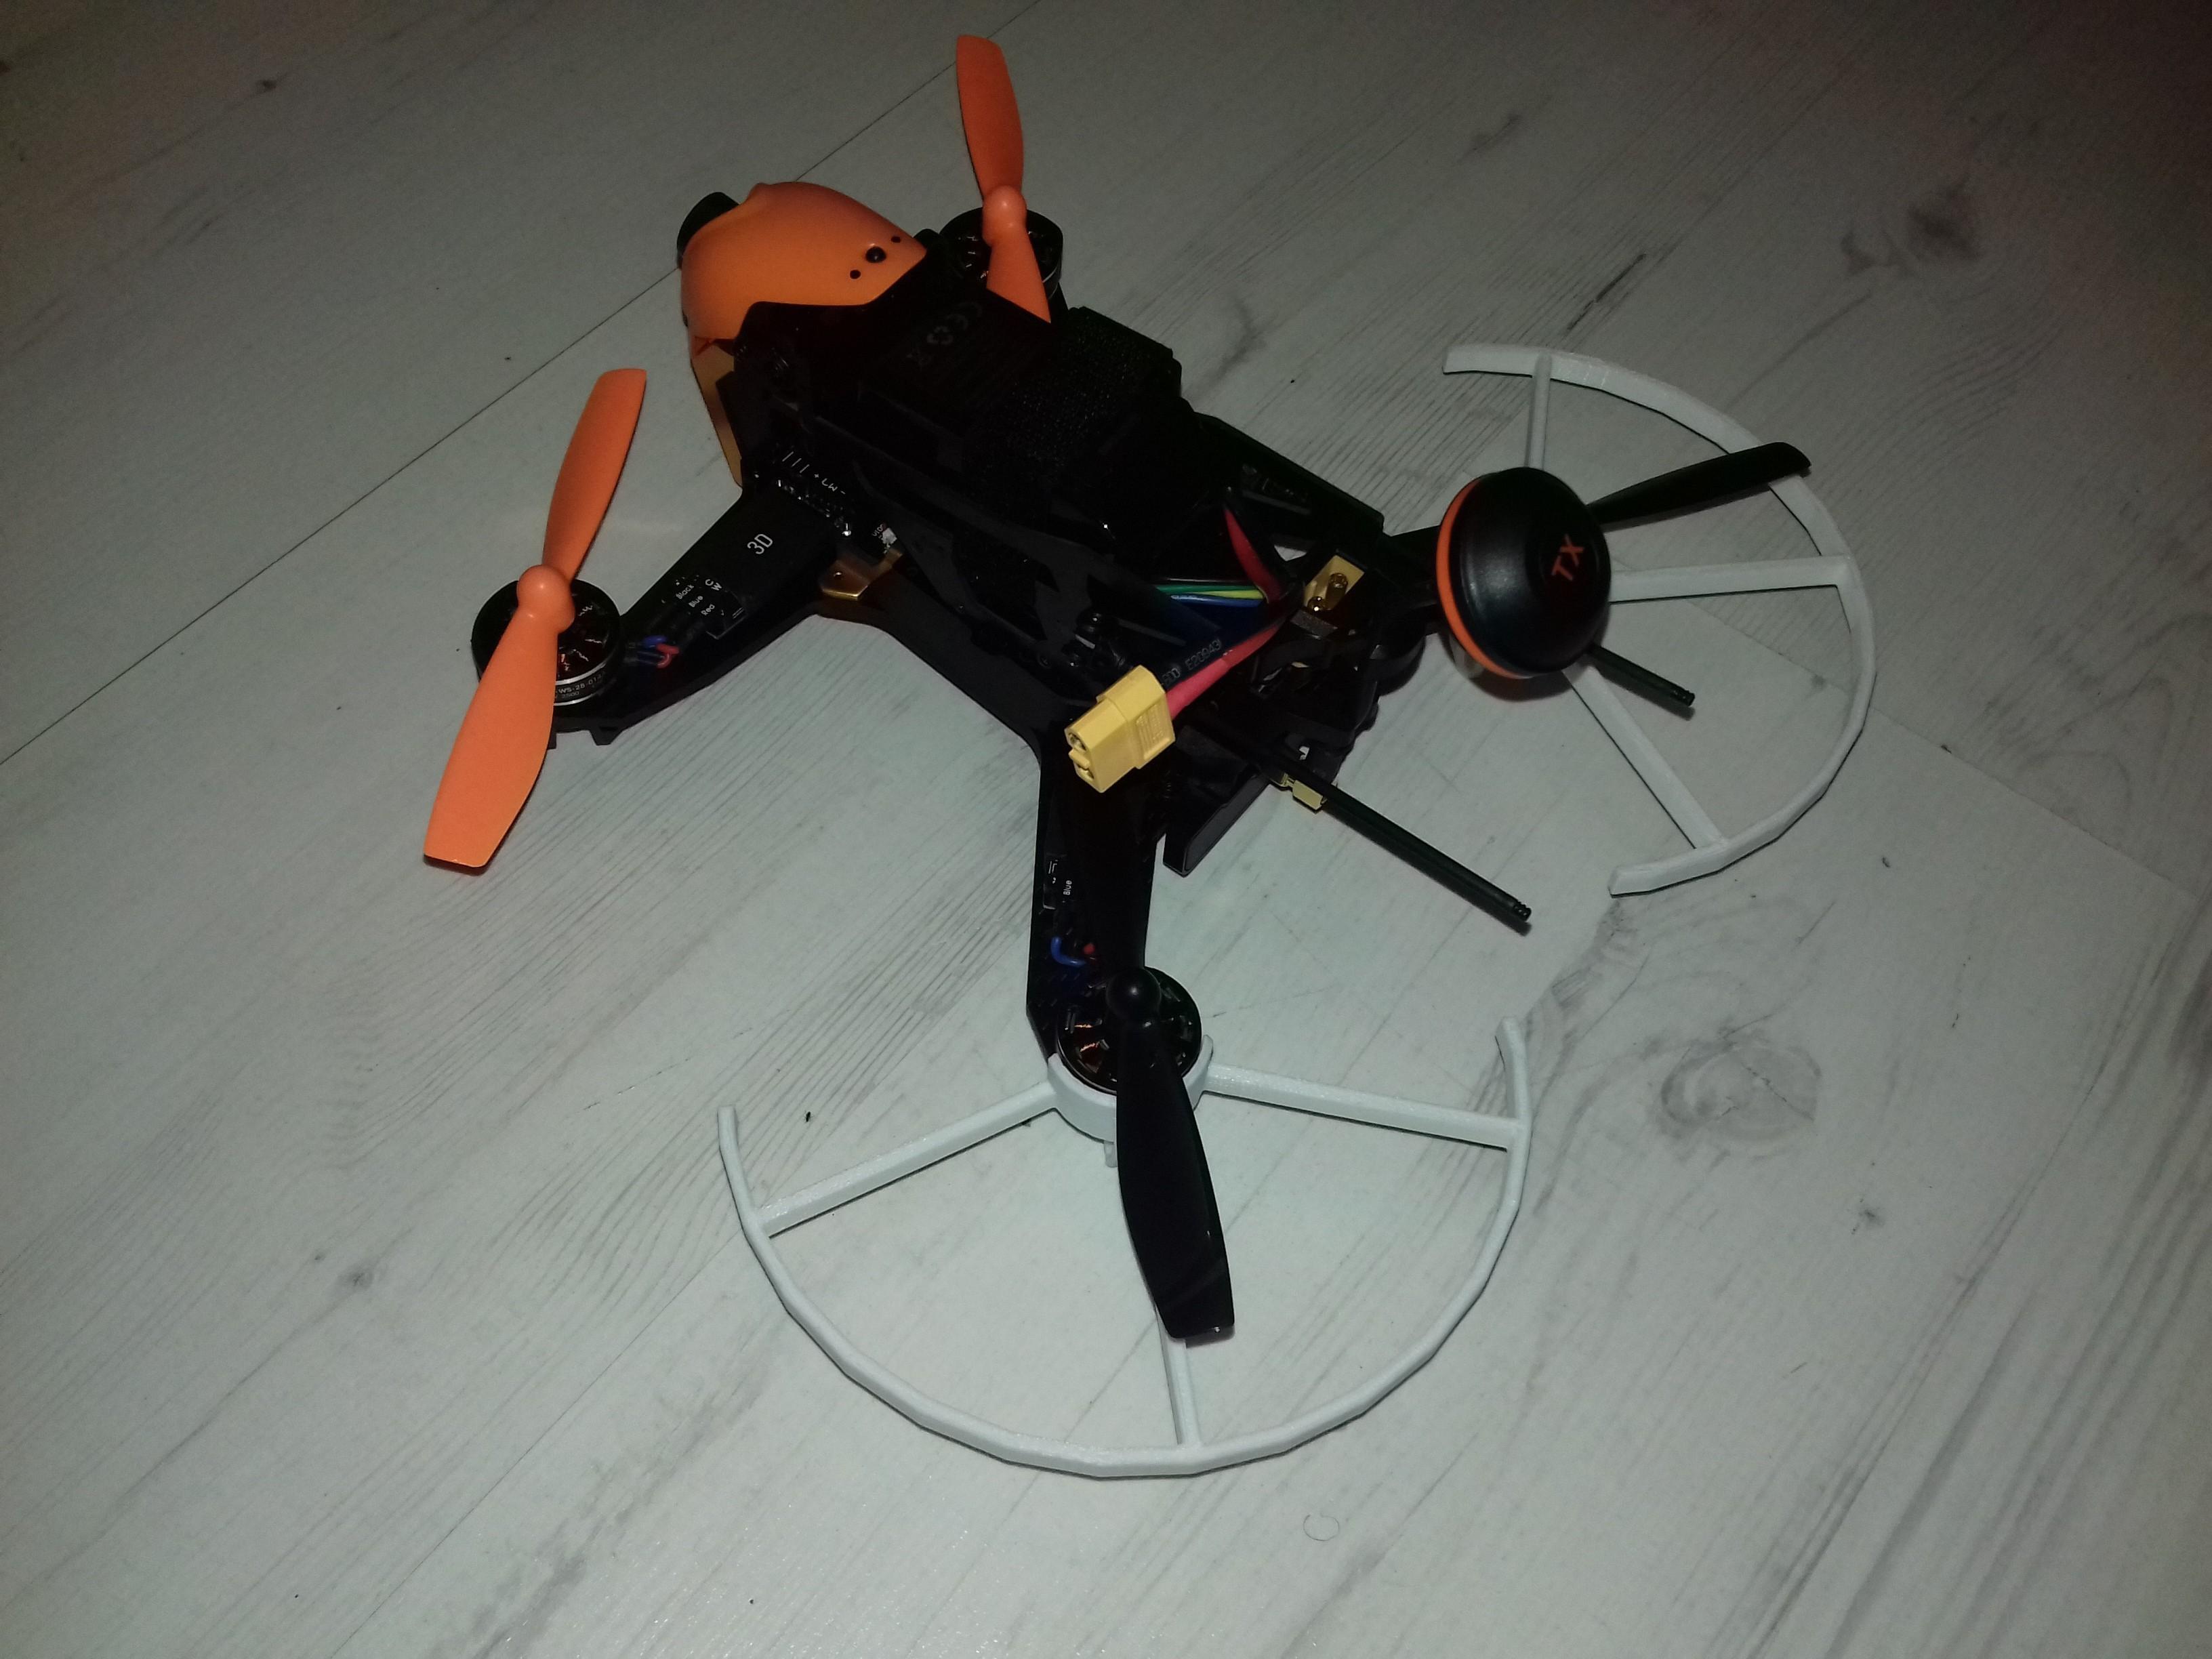 20171109_222801[1].jpg Download STL file Walkera F210 propeller guard • 3D printer object, Minkus